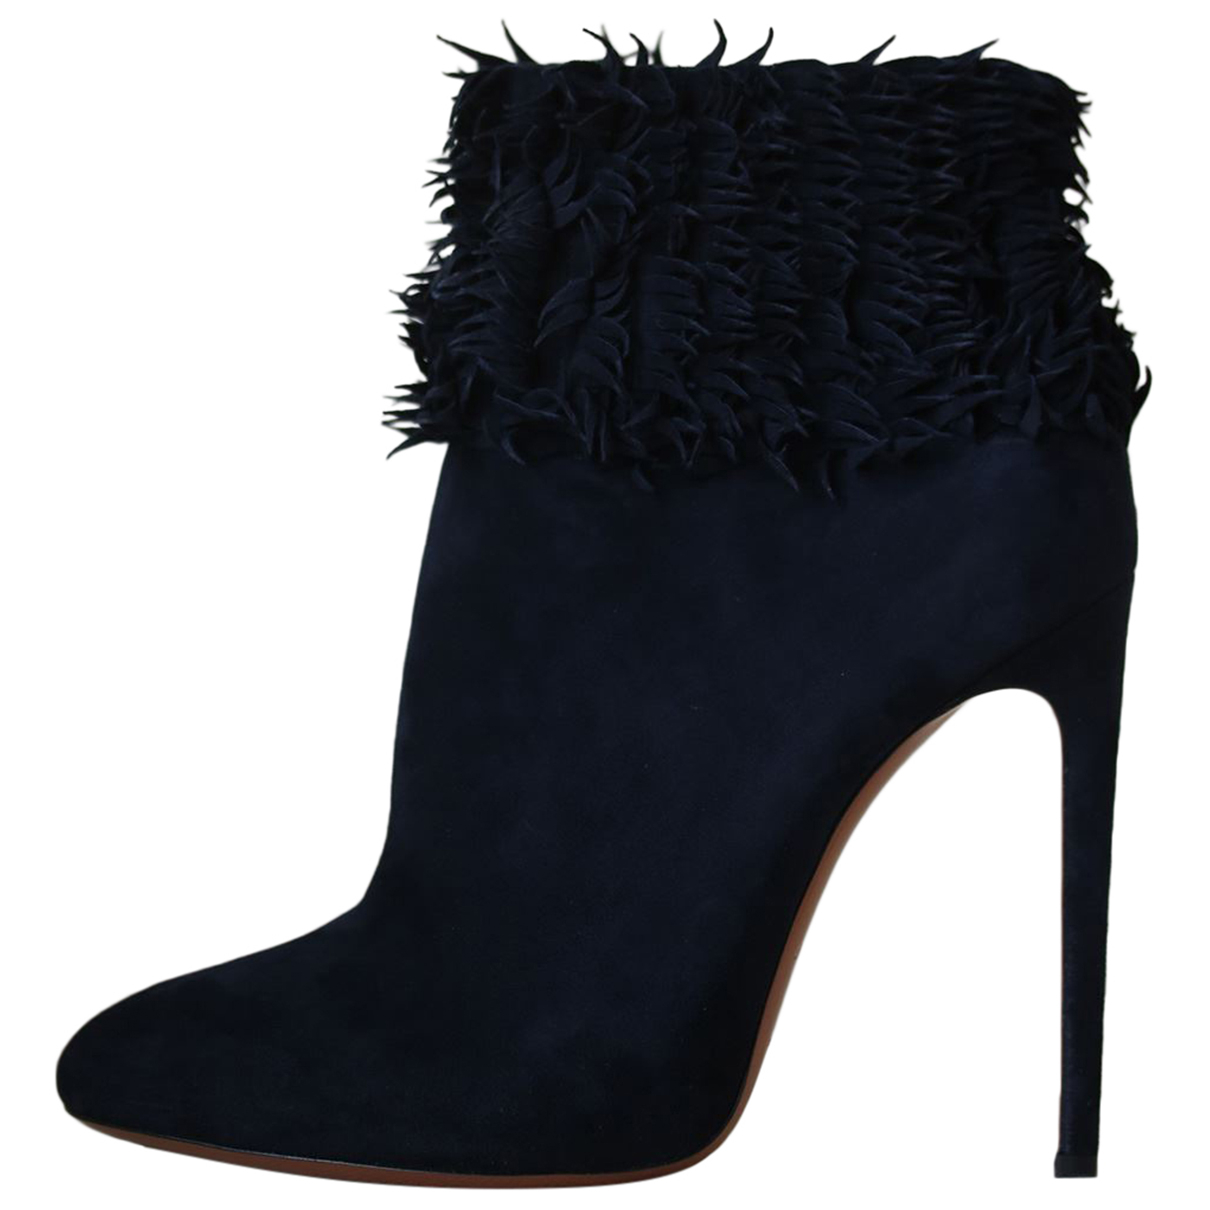 Alaïa N Black Suede Ankle boots for Women 41 EU